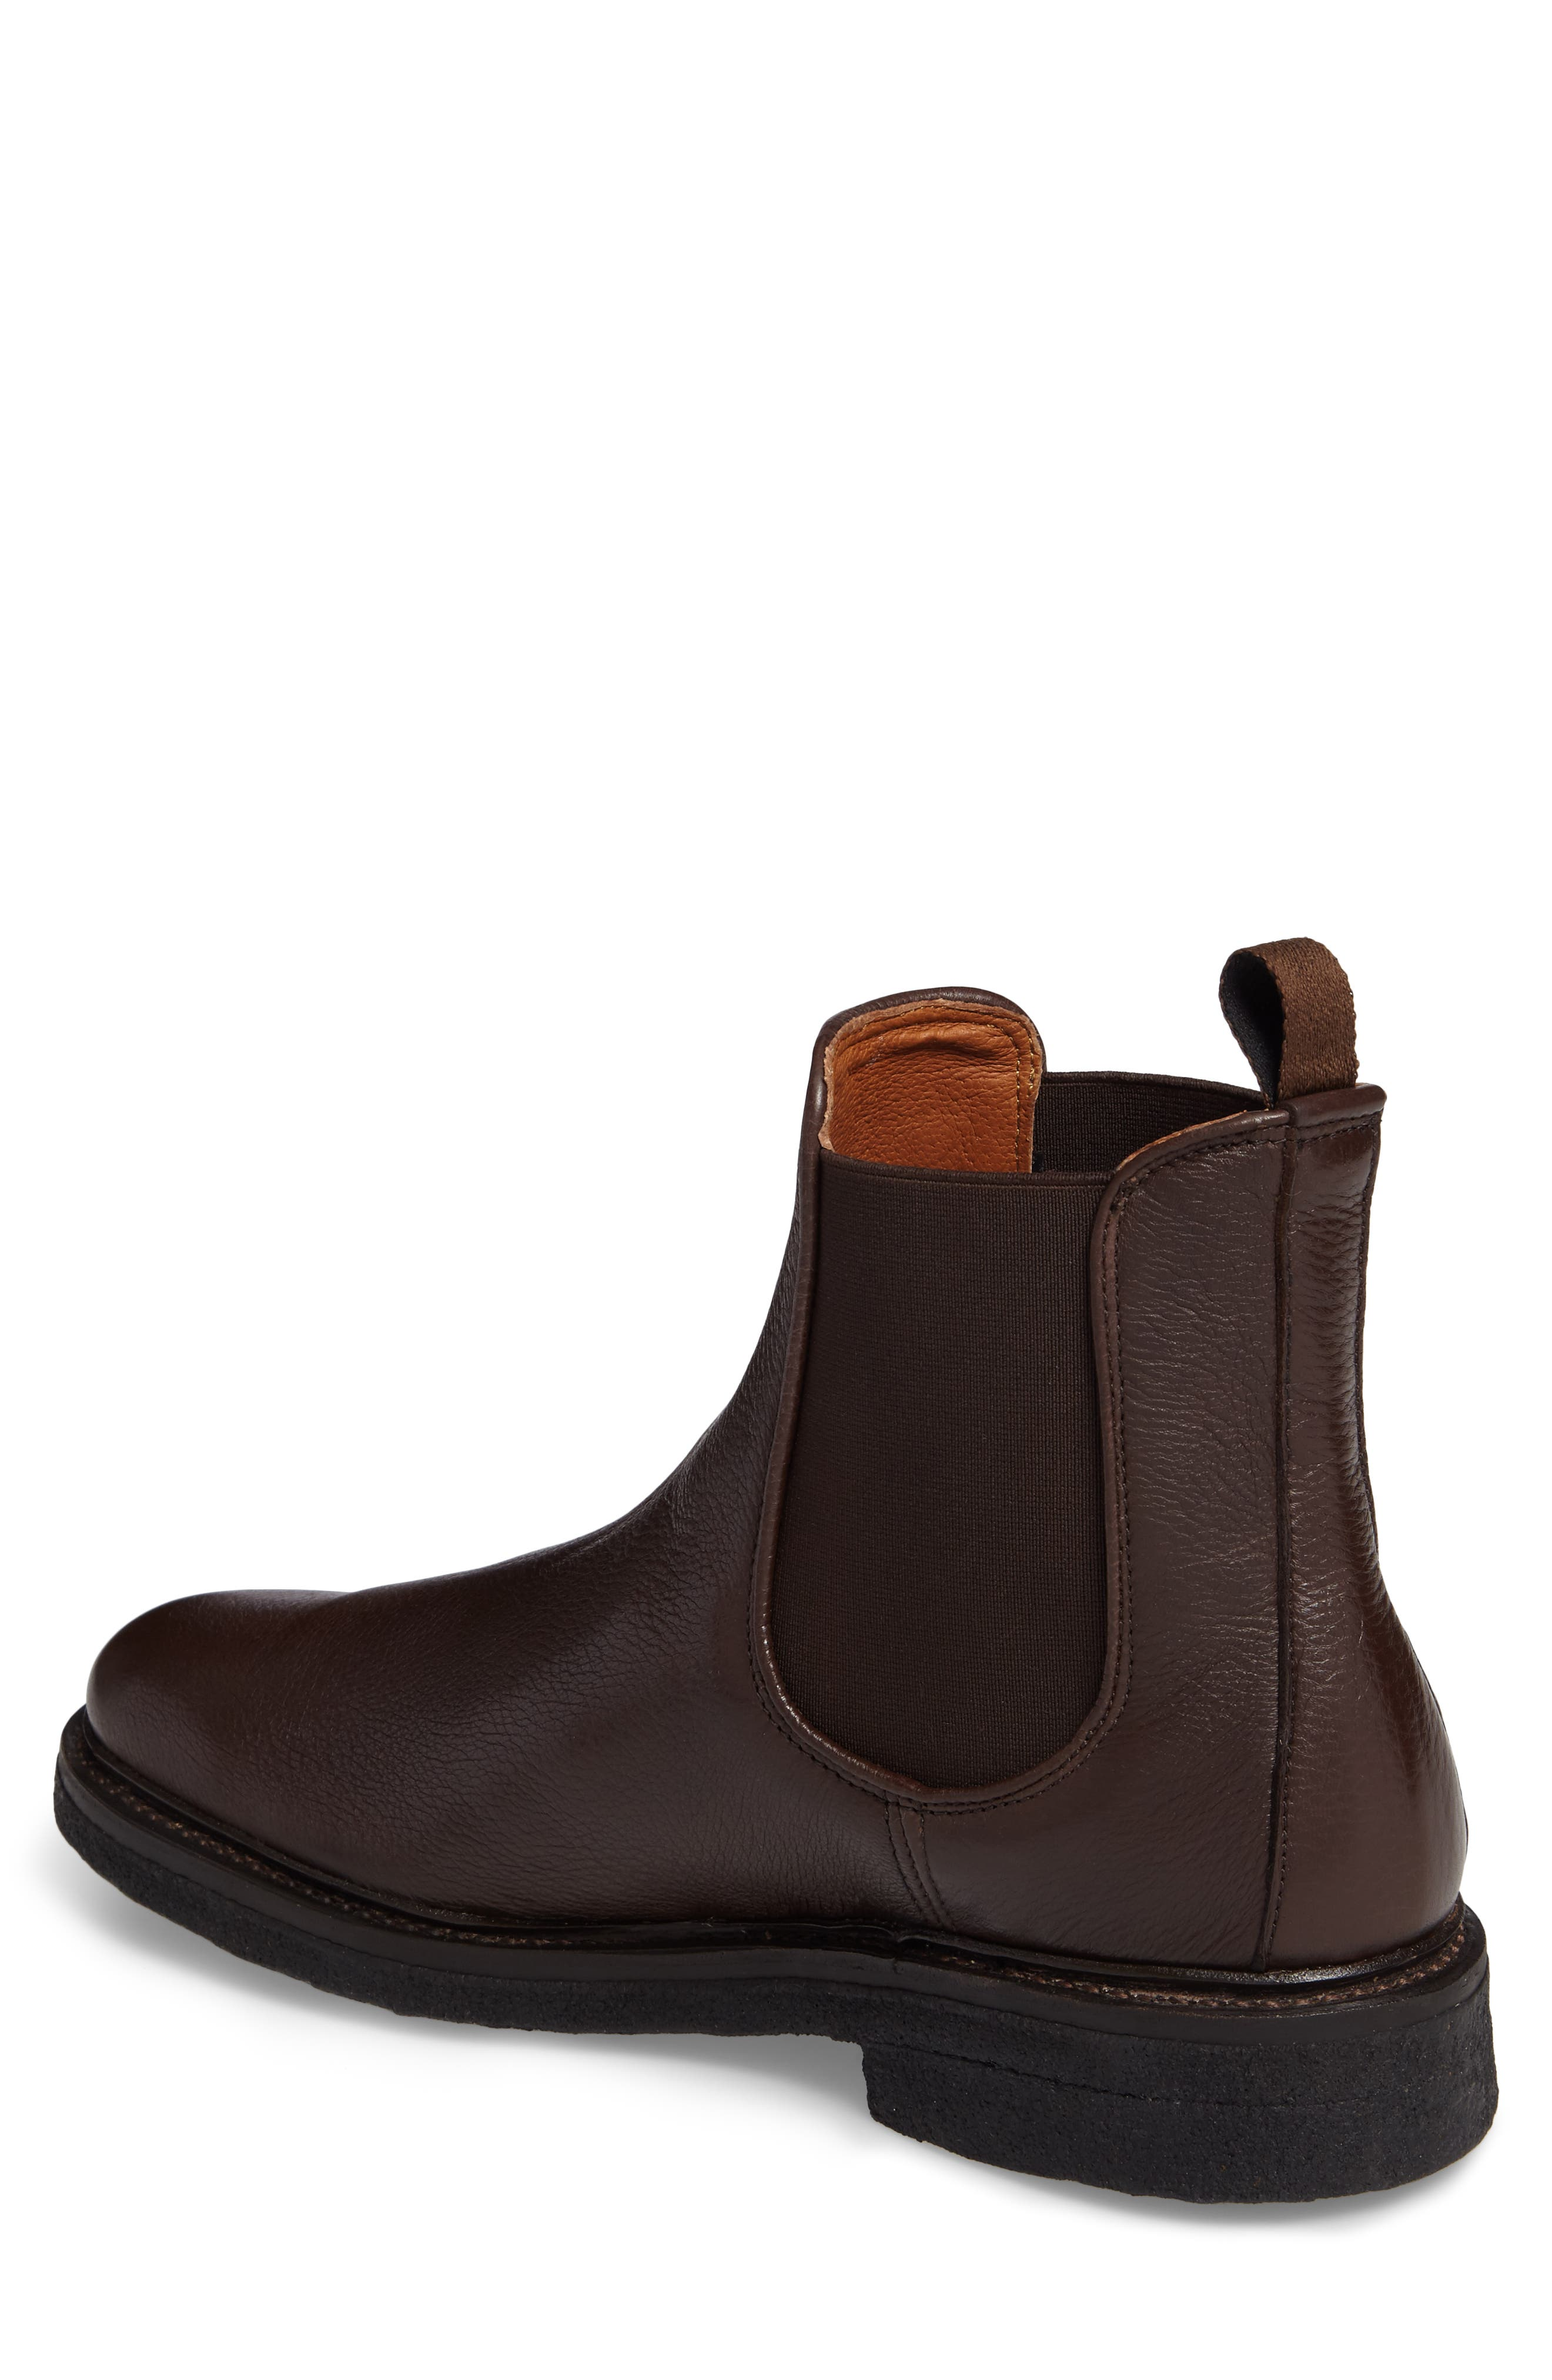 Country Chelsea Boot,                             Alternate thumbnail 2, color,                             Dark Brown